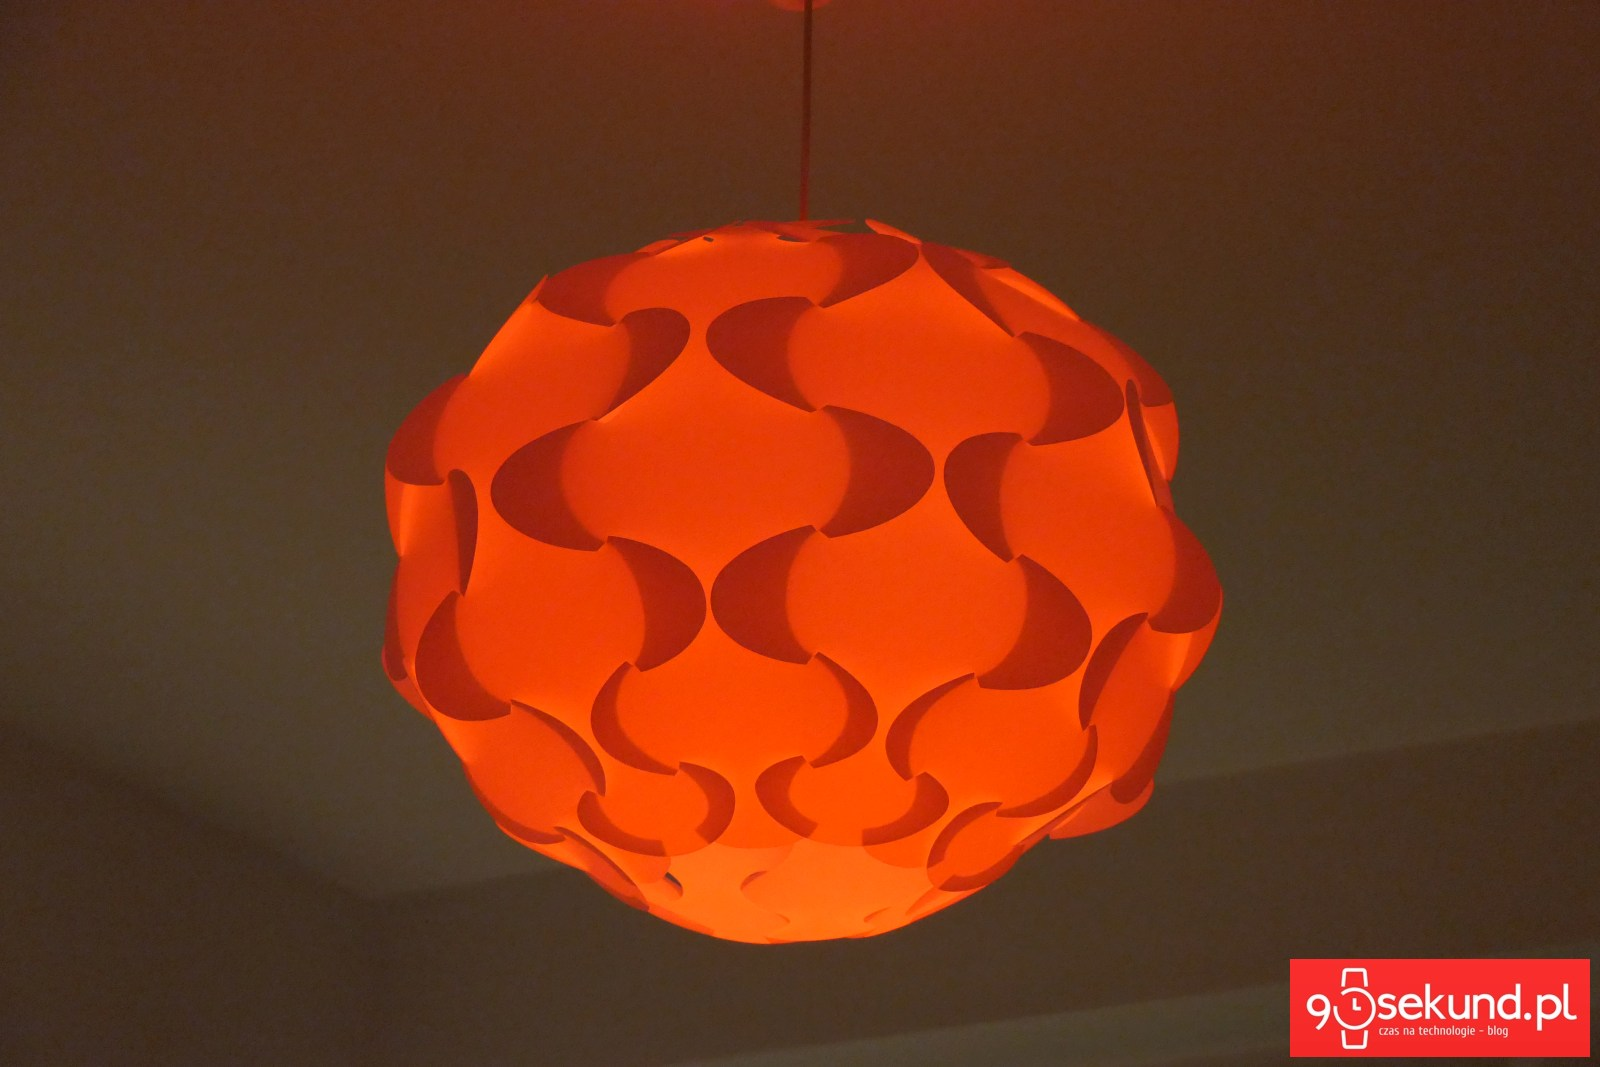 Test Recenzja Opinia Lampy Philips Hue Kapitalny